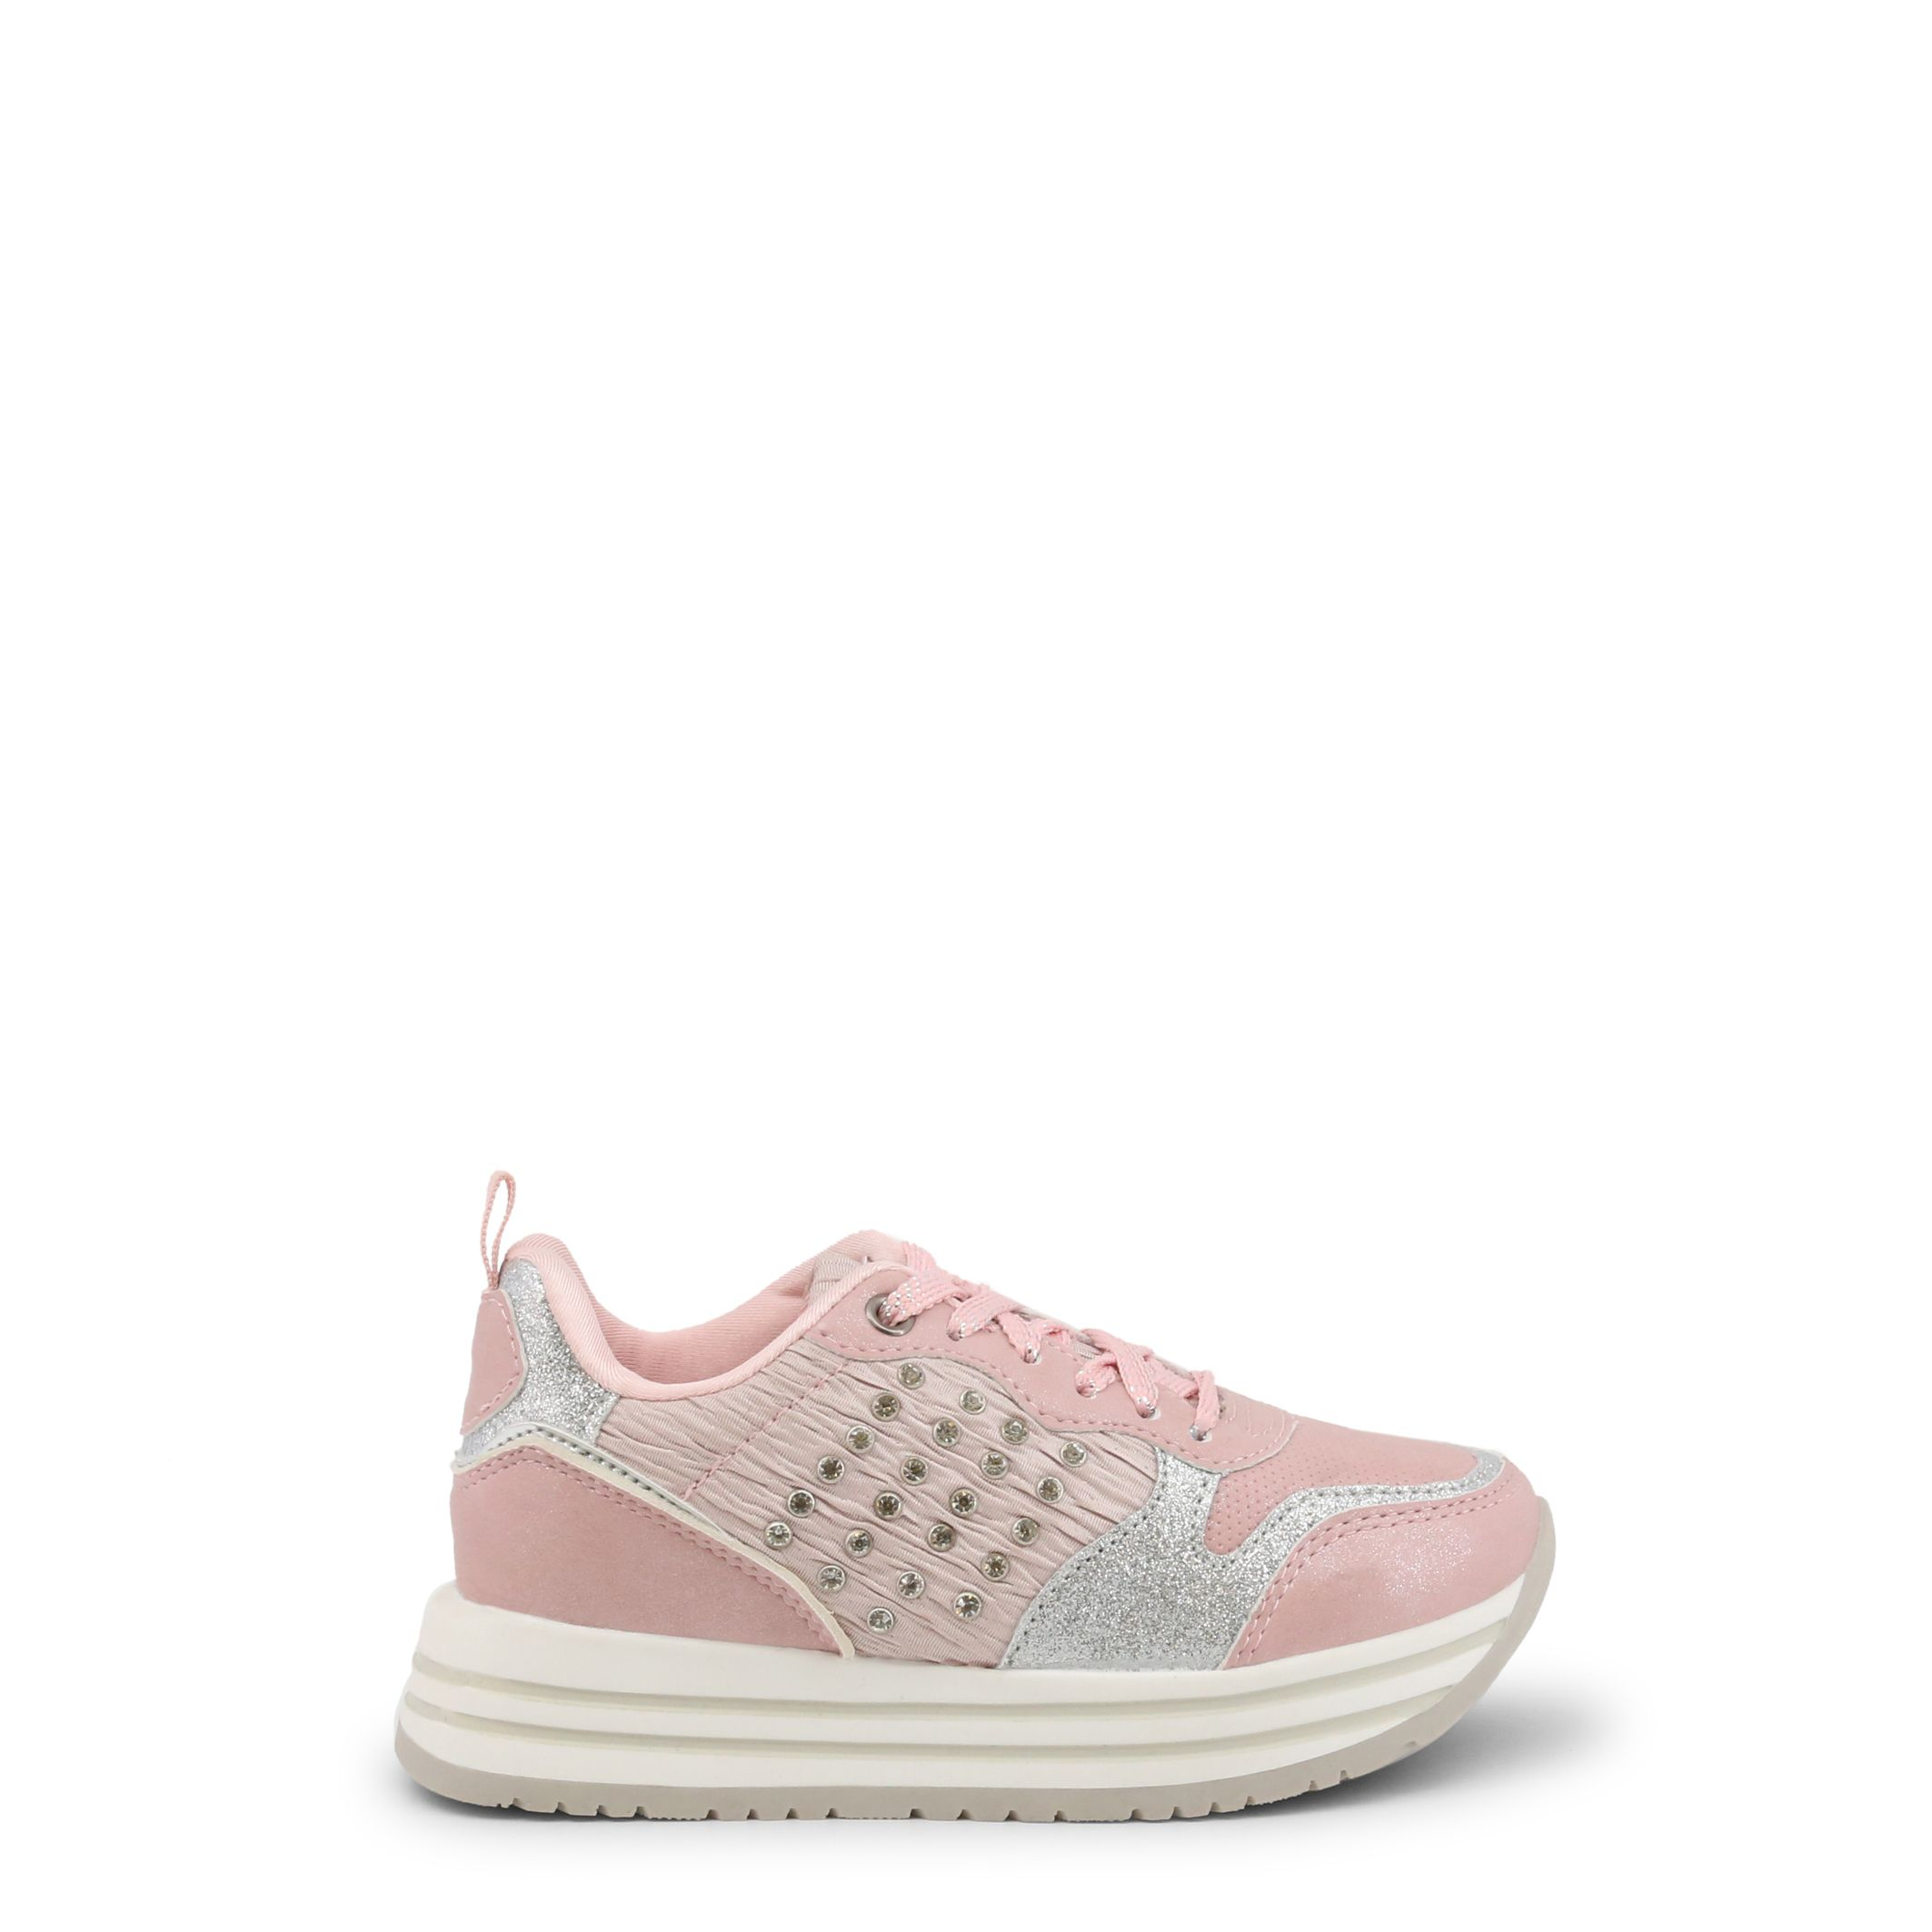 Shone – 9110-010 – Roze Designeritems.nl